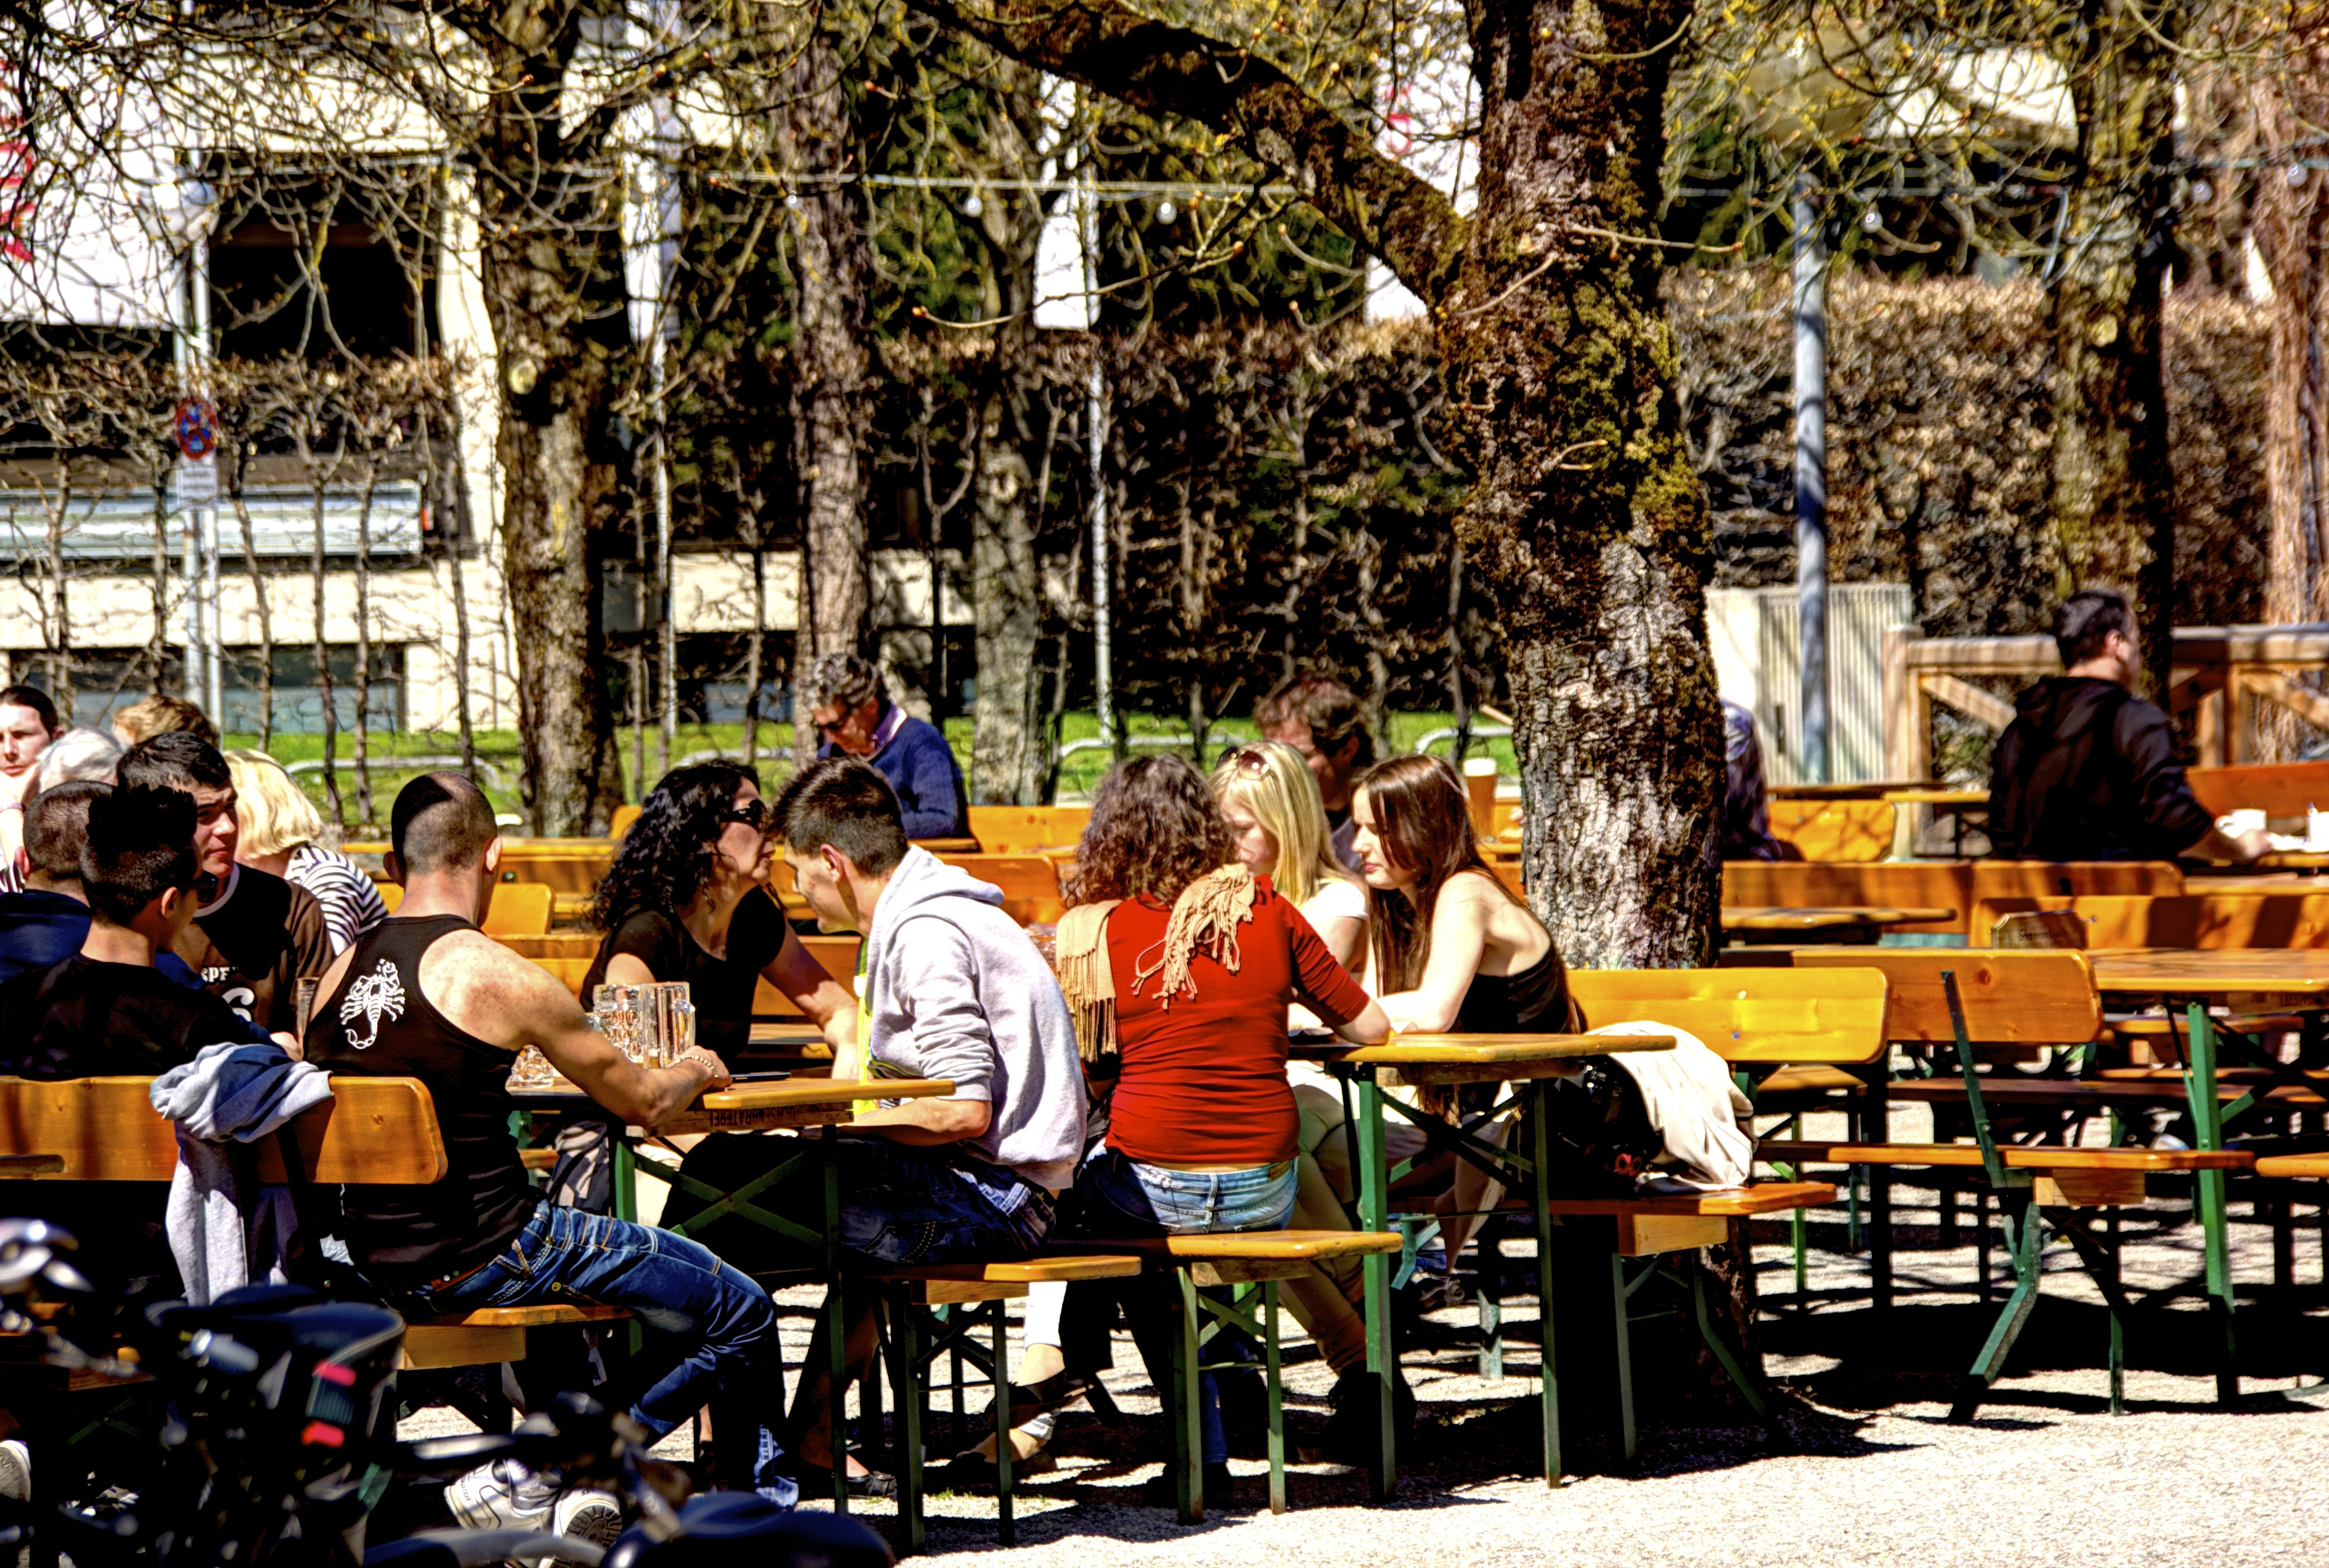 westpark münchen biergarten